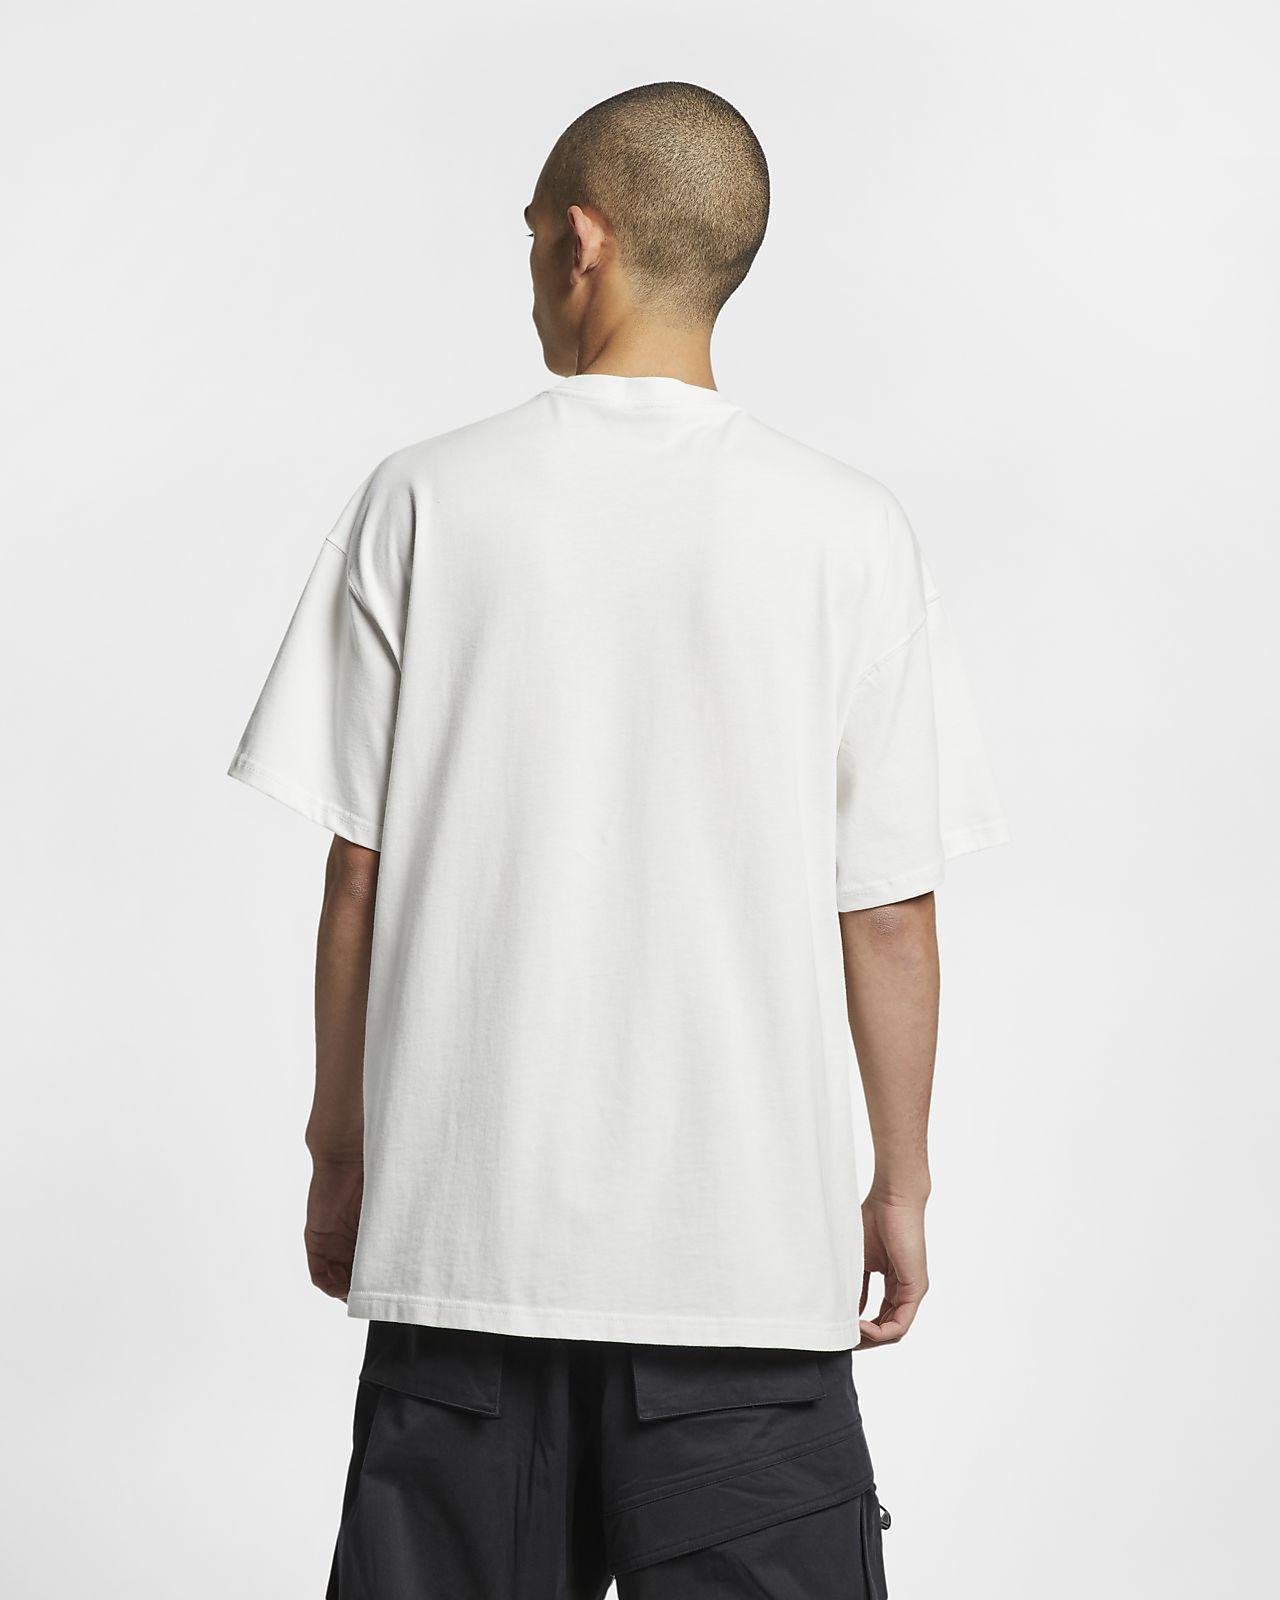 a95dfa193 Nike ACG Logo T-Shirt. Nike.com NL